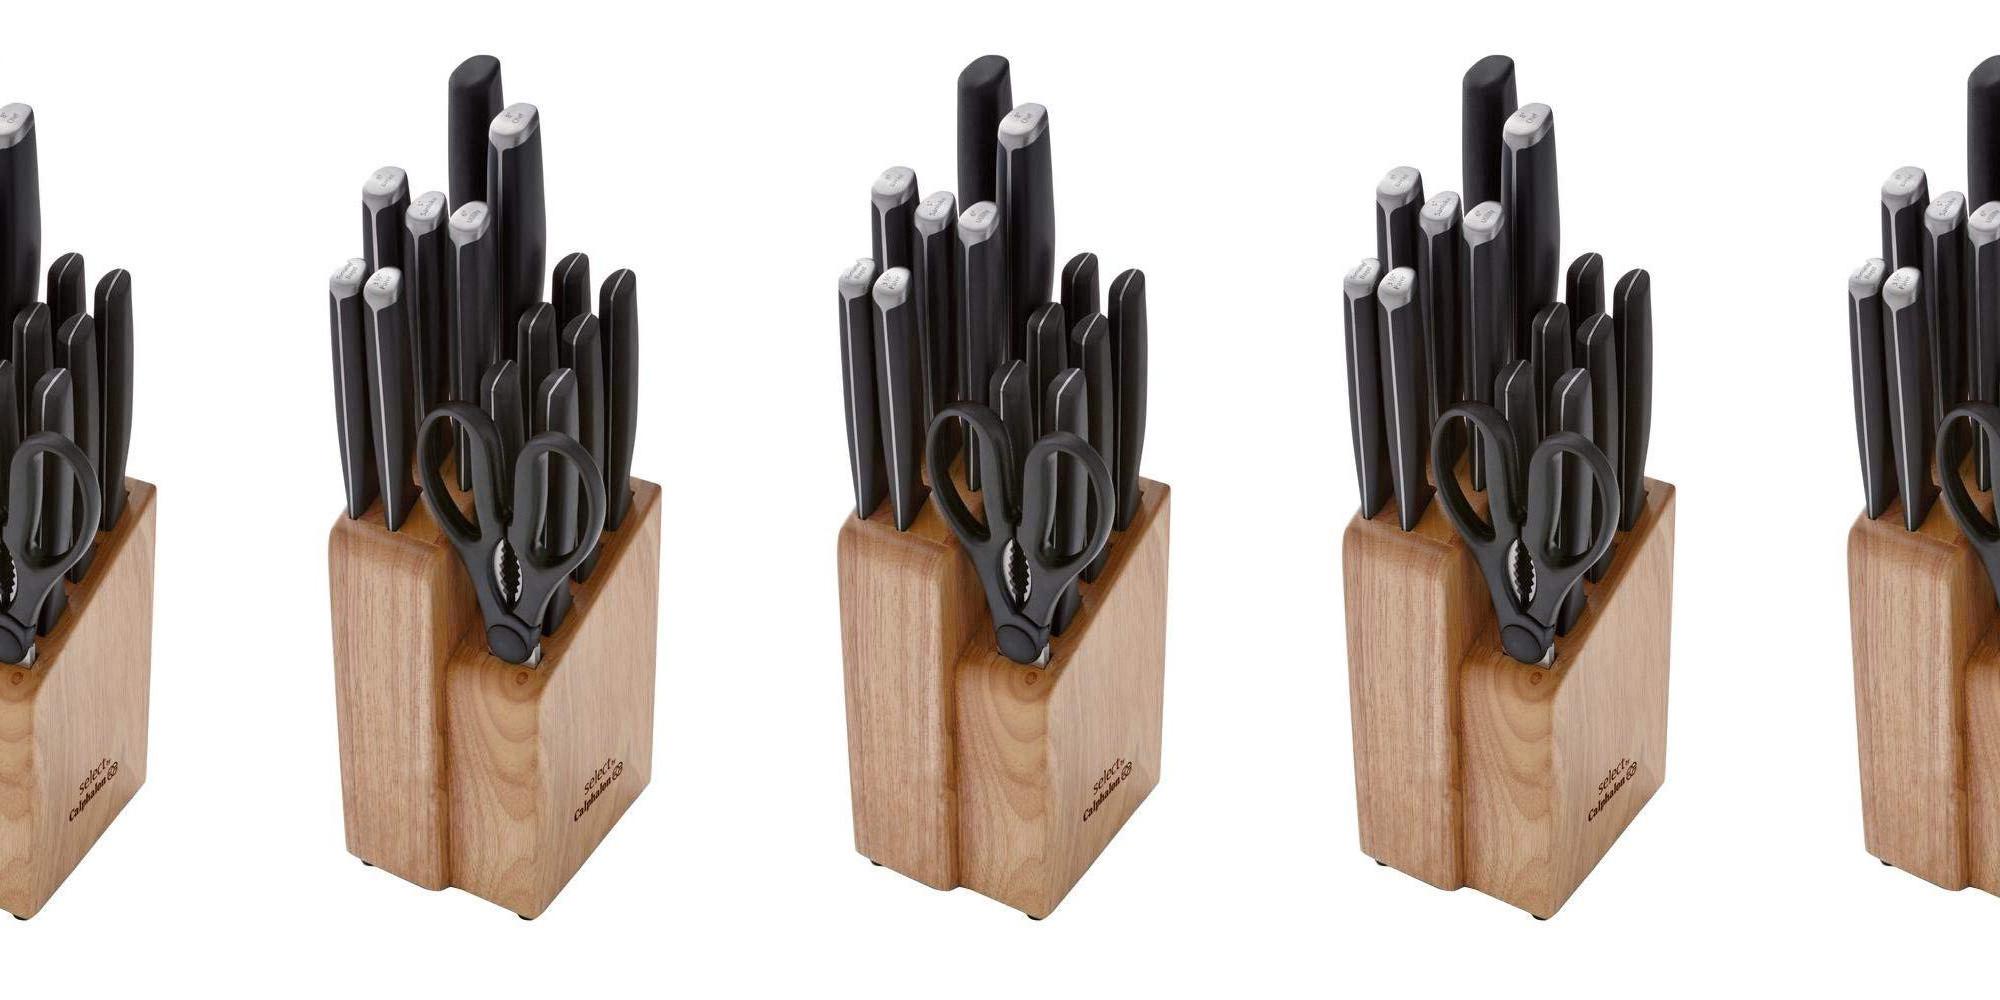 Calphalon Select 15 Piece Knife Block Set W 10 Yr